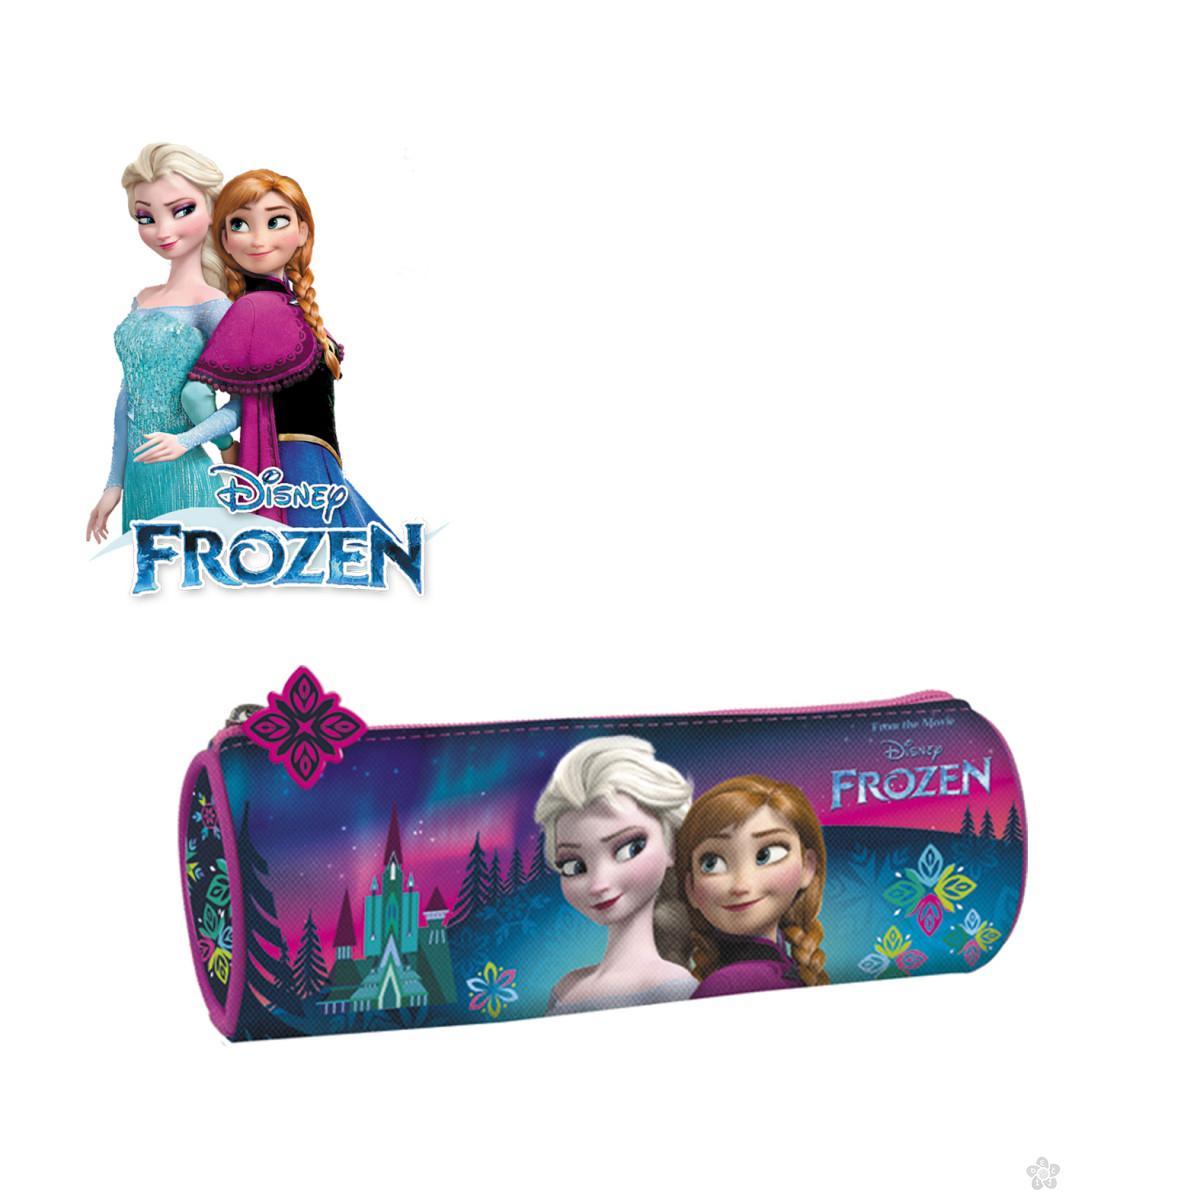 Okrugla pernica Frozen, PTKL24